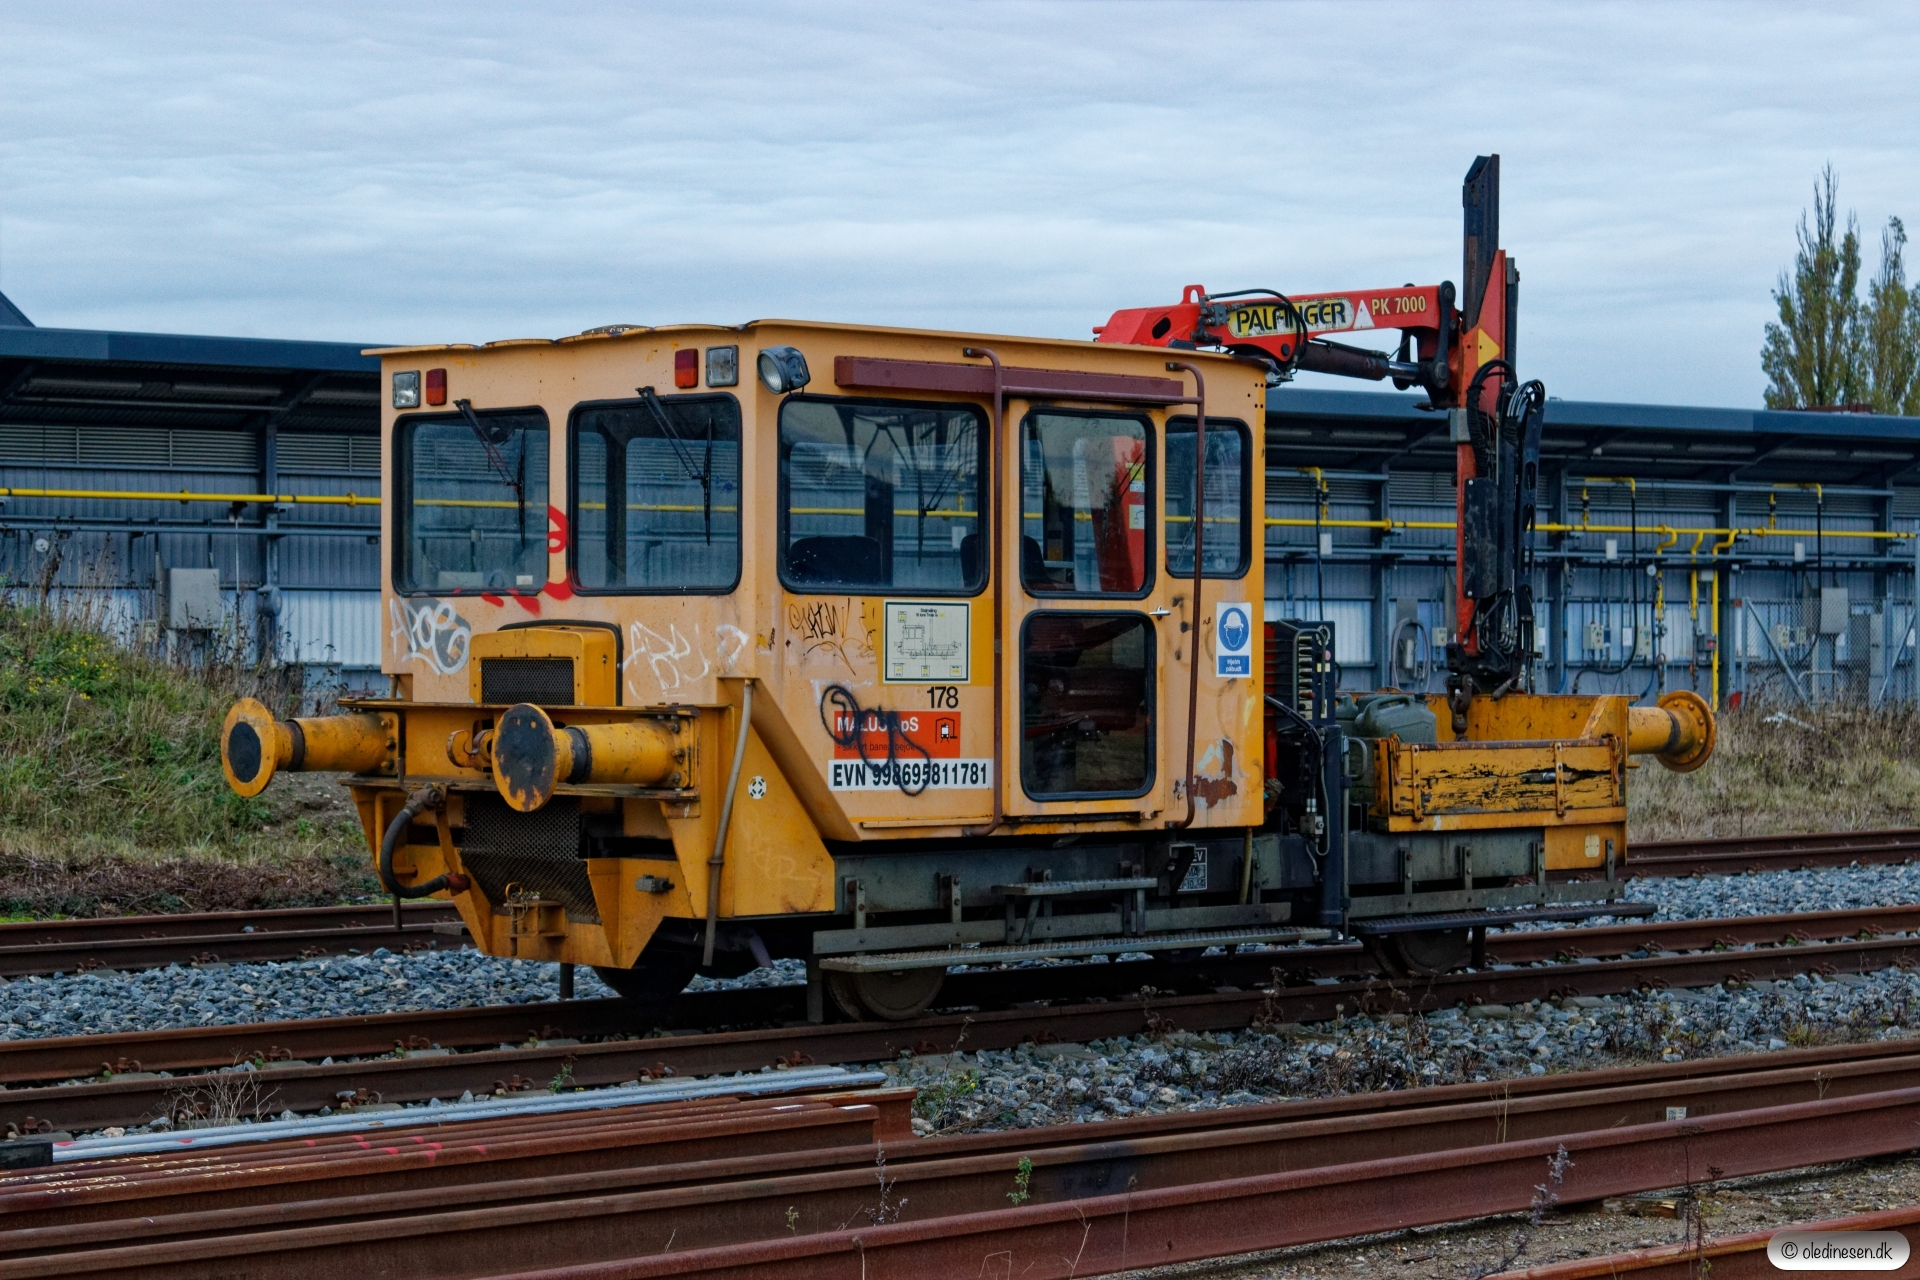 MALUS Trolje 178. Odense 03.11.2019.